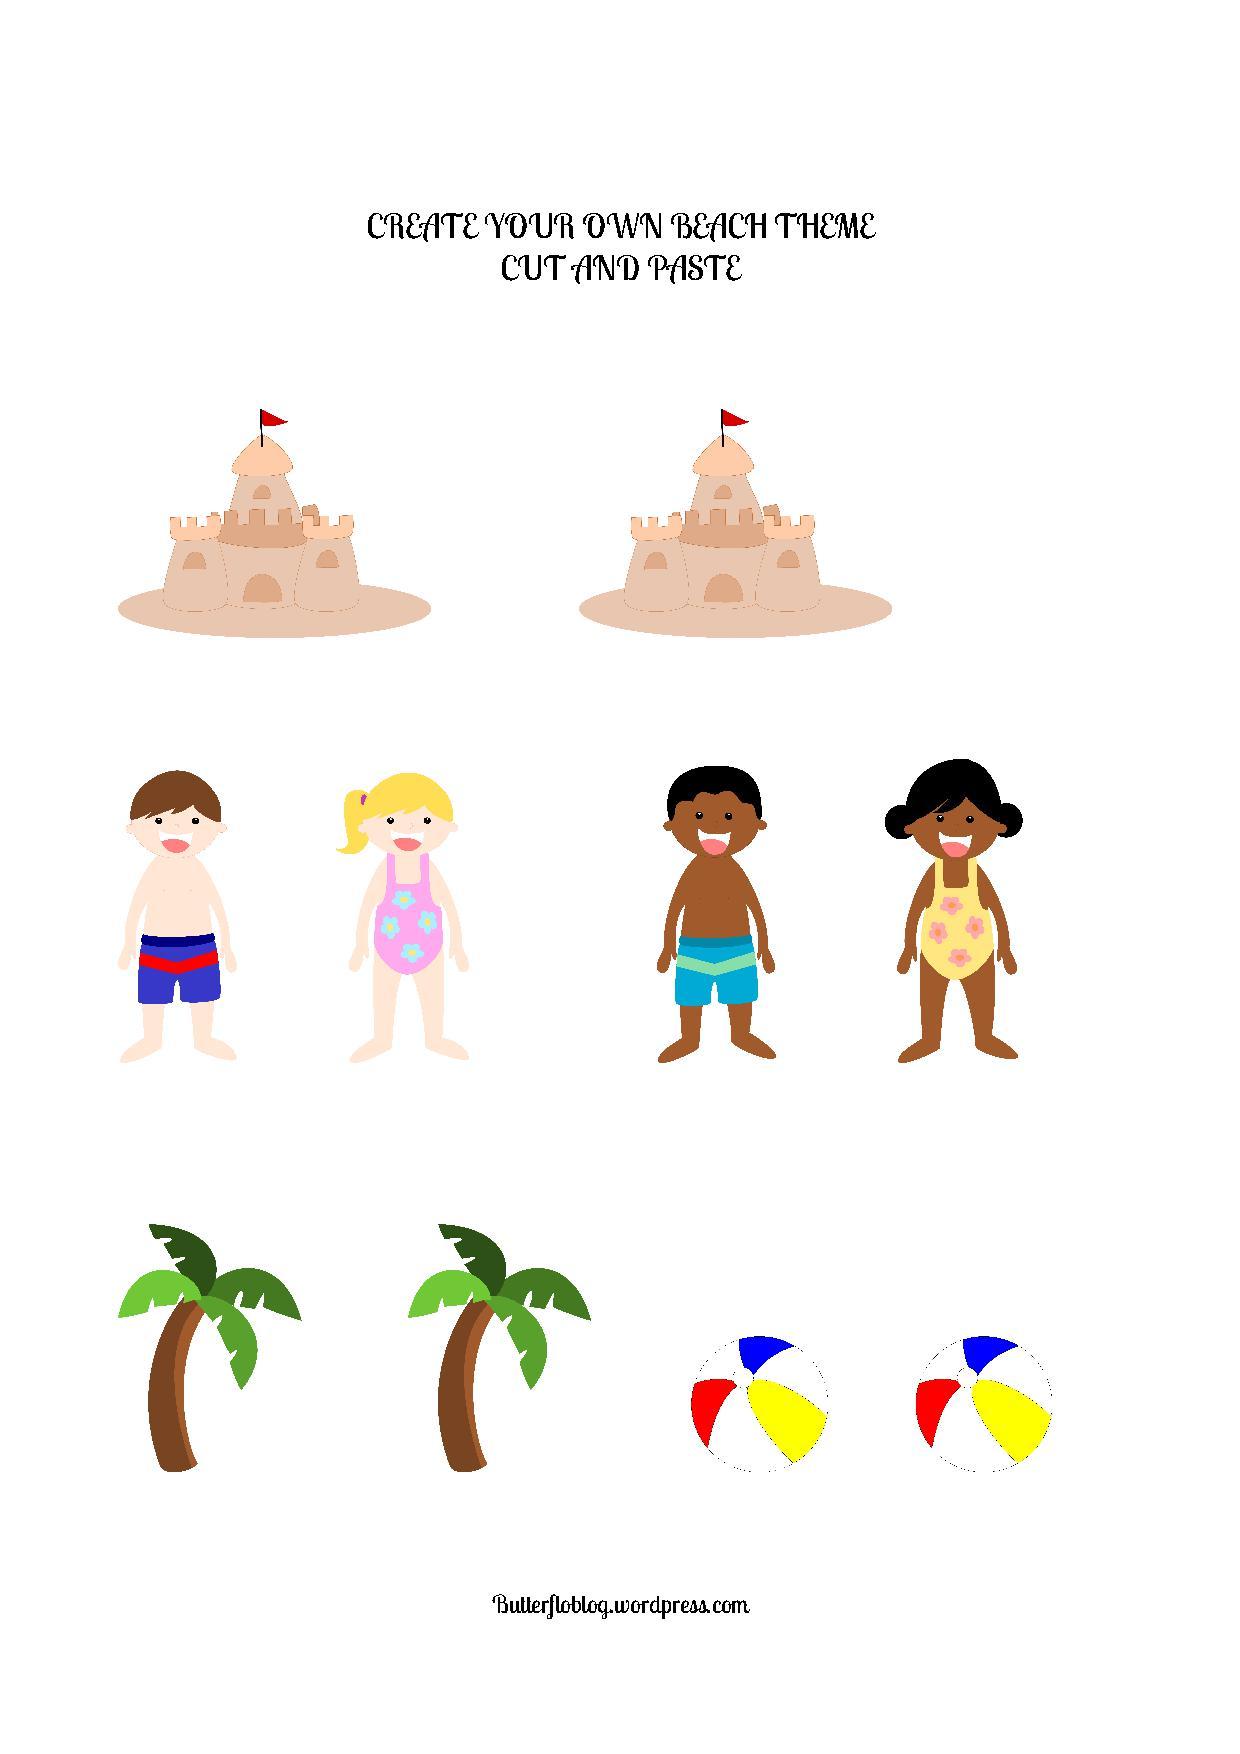 Create Your Own Beach Theme Activity Butterflo Kids